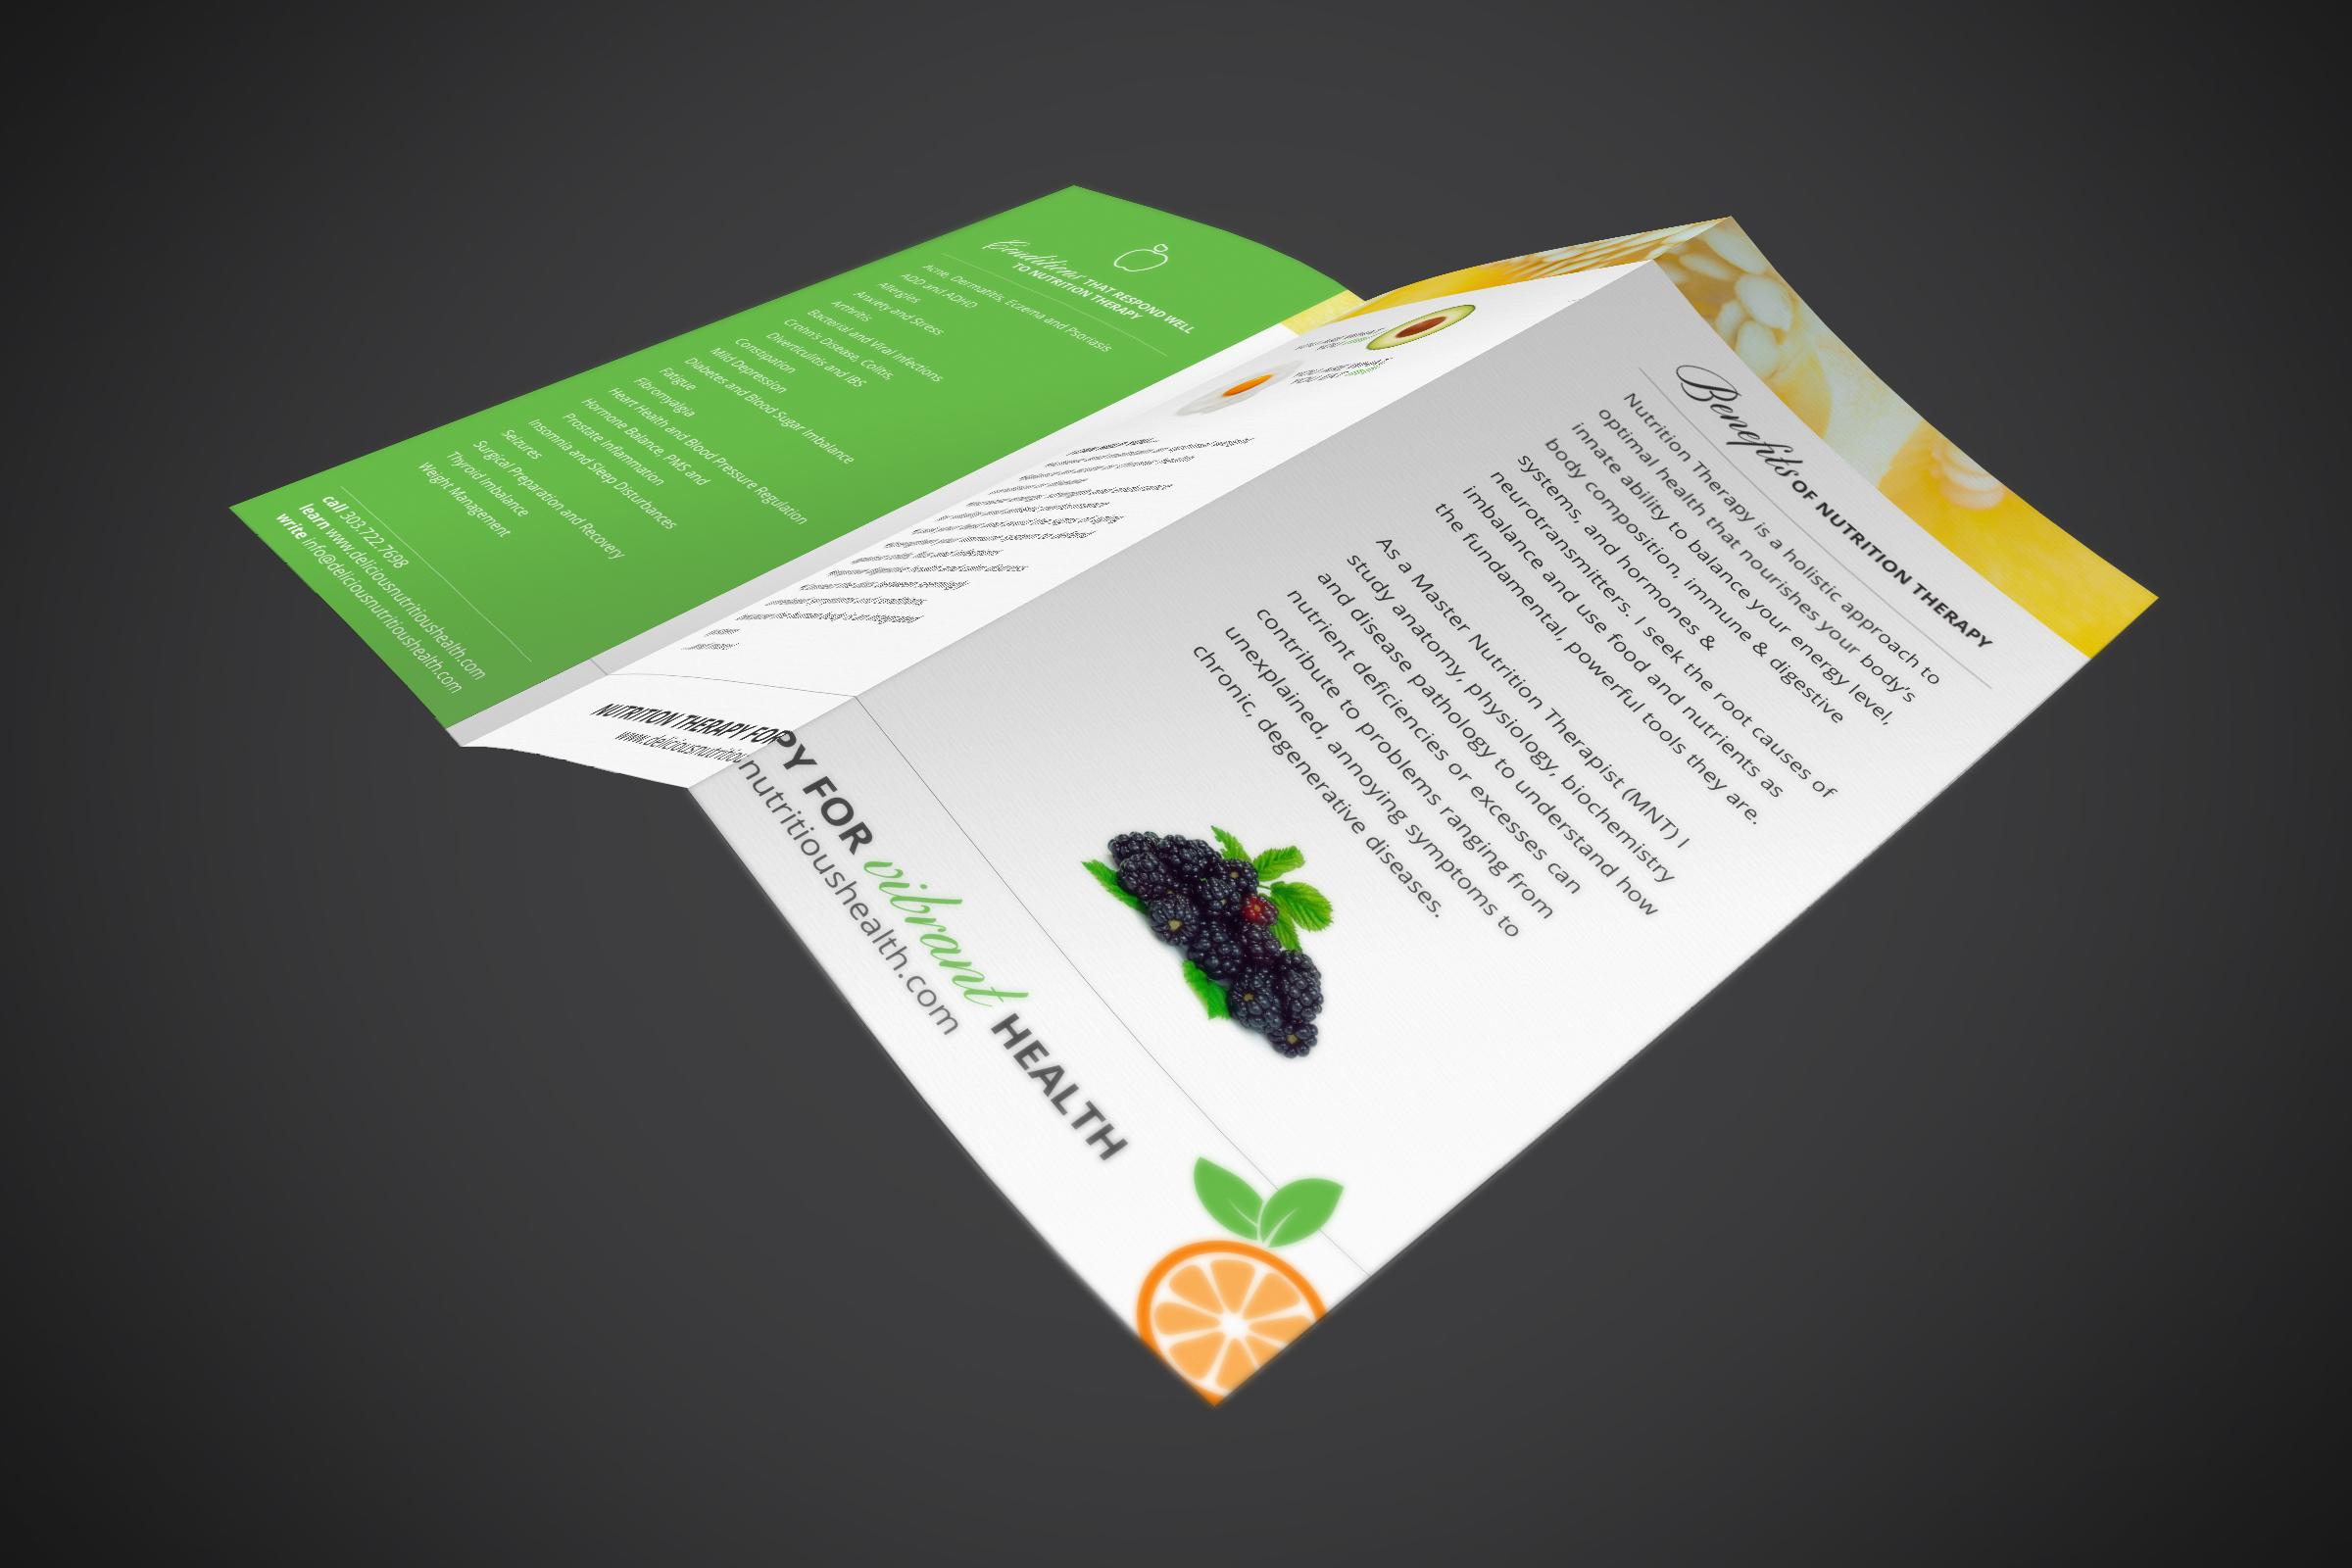 hearthfire-creative-logo-brand-identity-designer-denver-colorado-delicious-nutritious-5.jpg